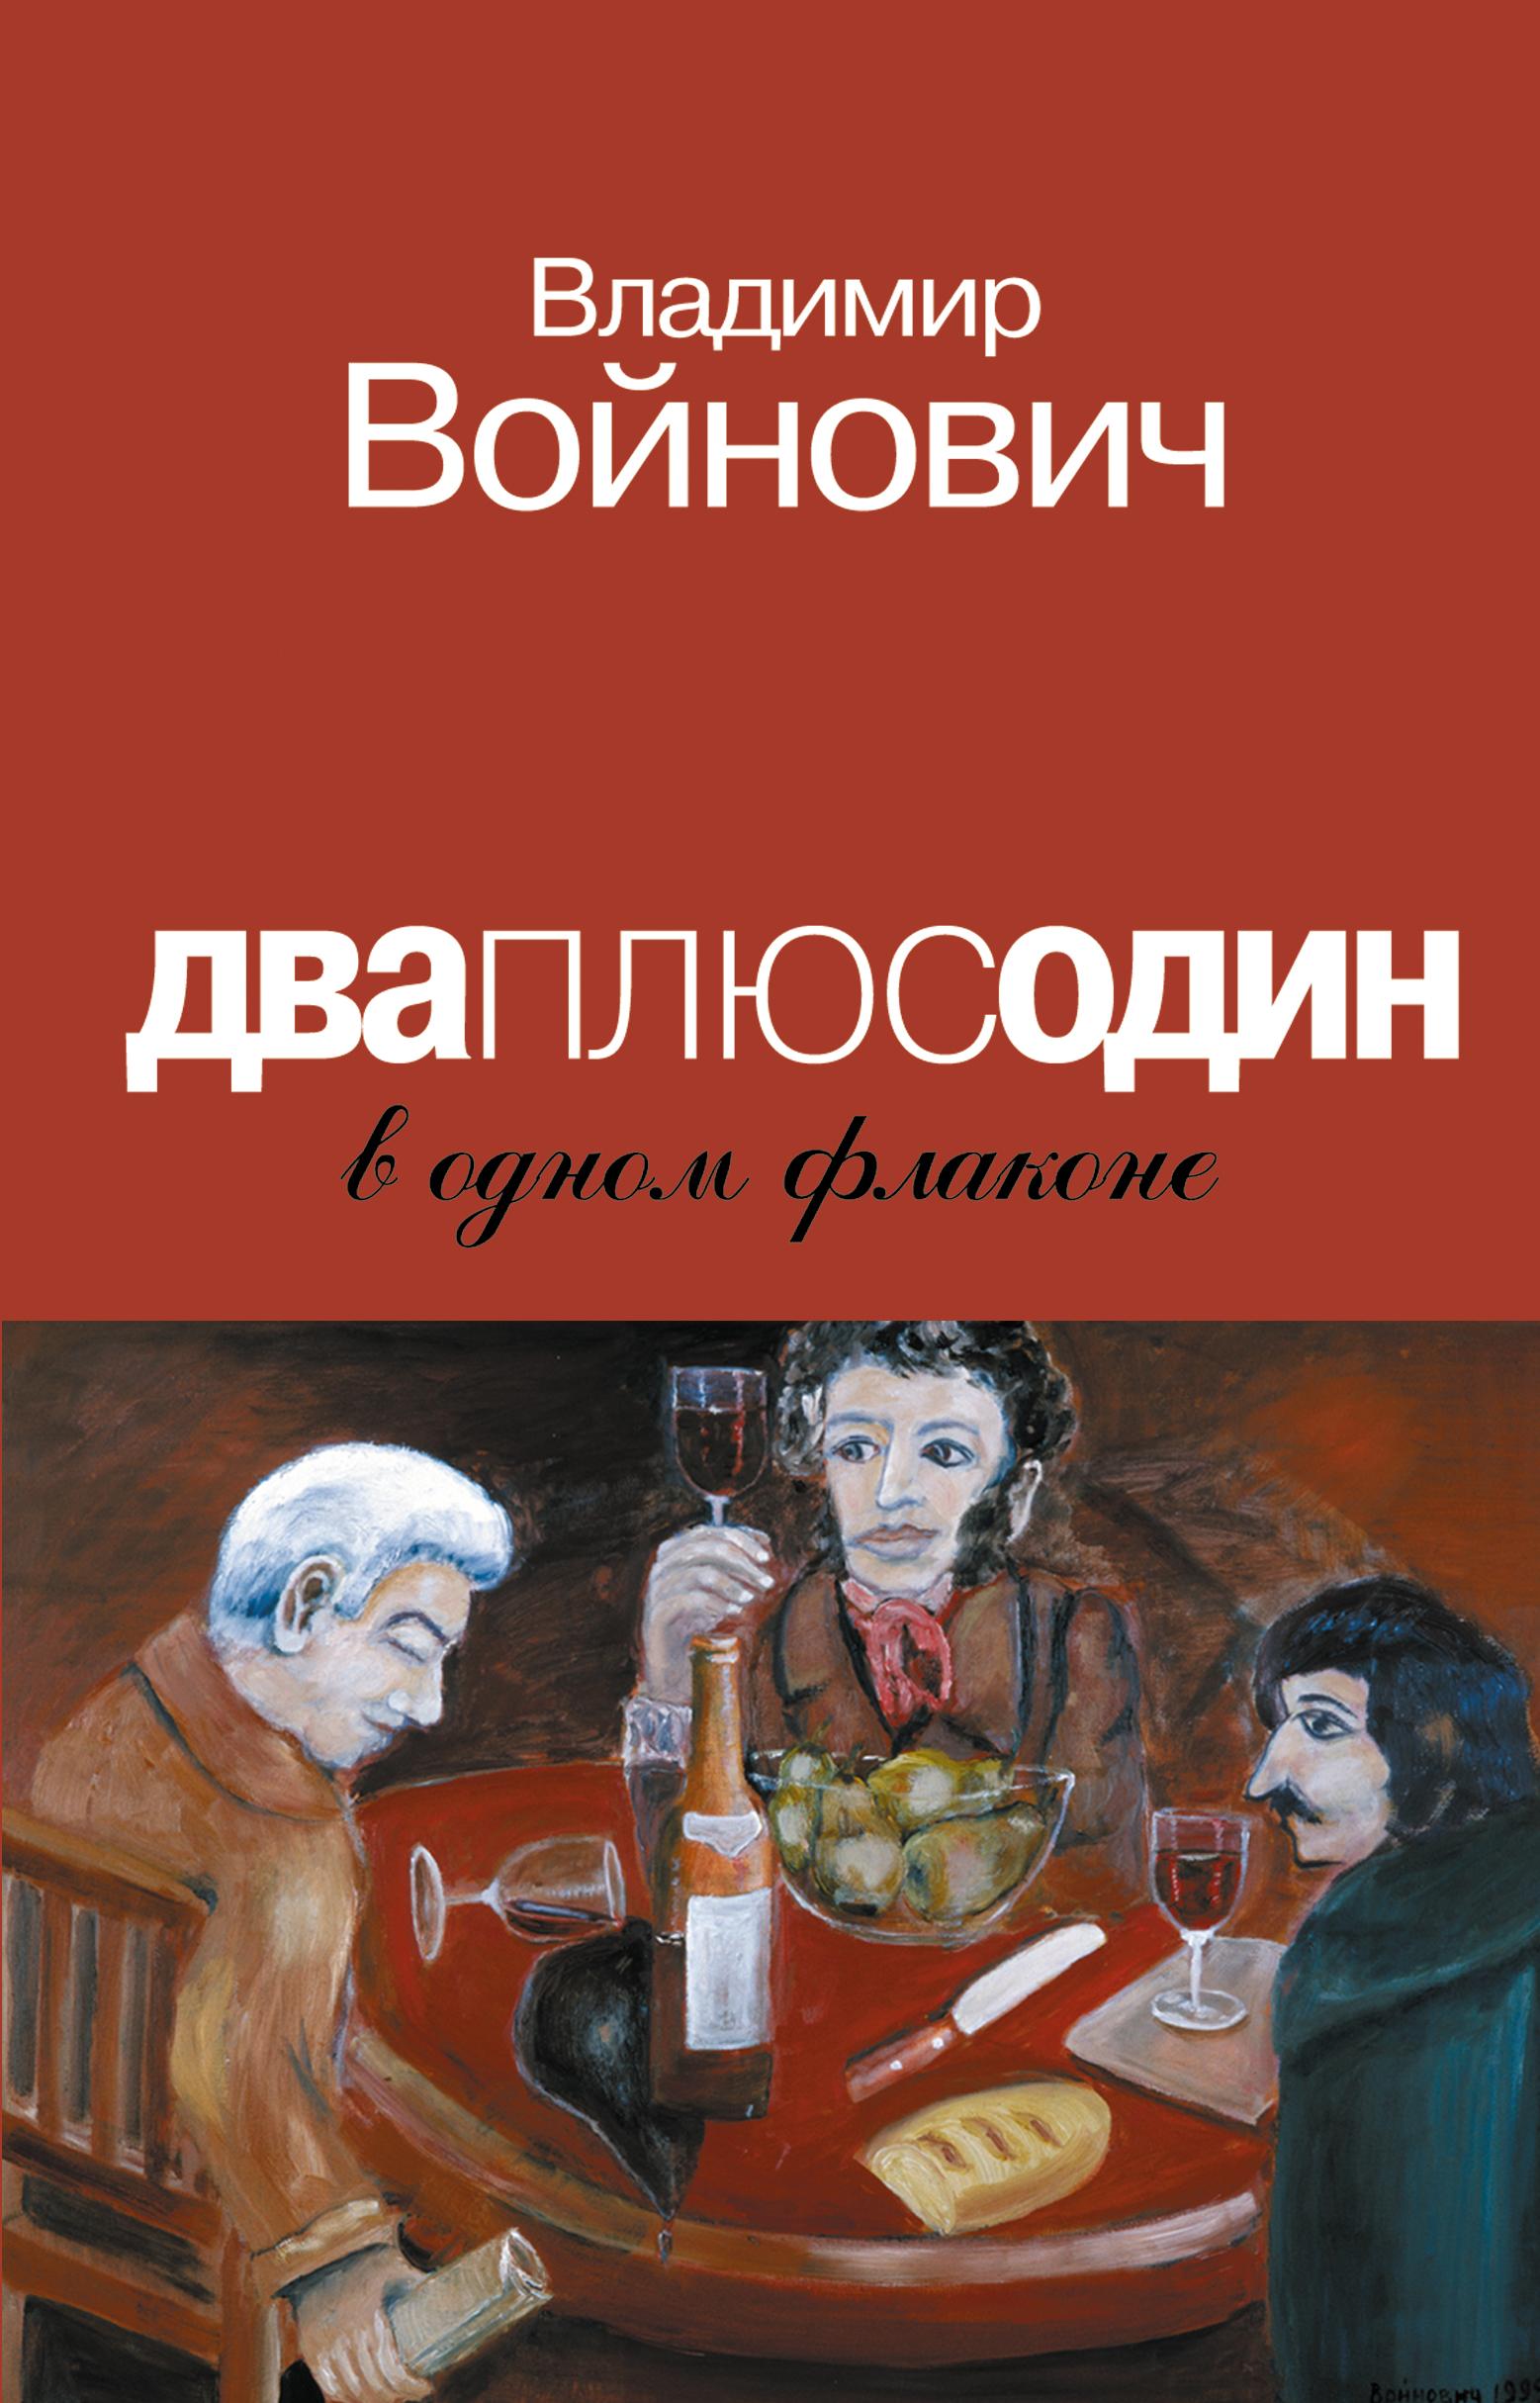 Владимир Войнович Дваплюсодин в одном флаконе (сборник) владимир войнович иванькиада